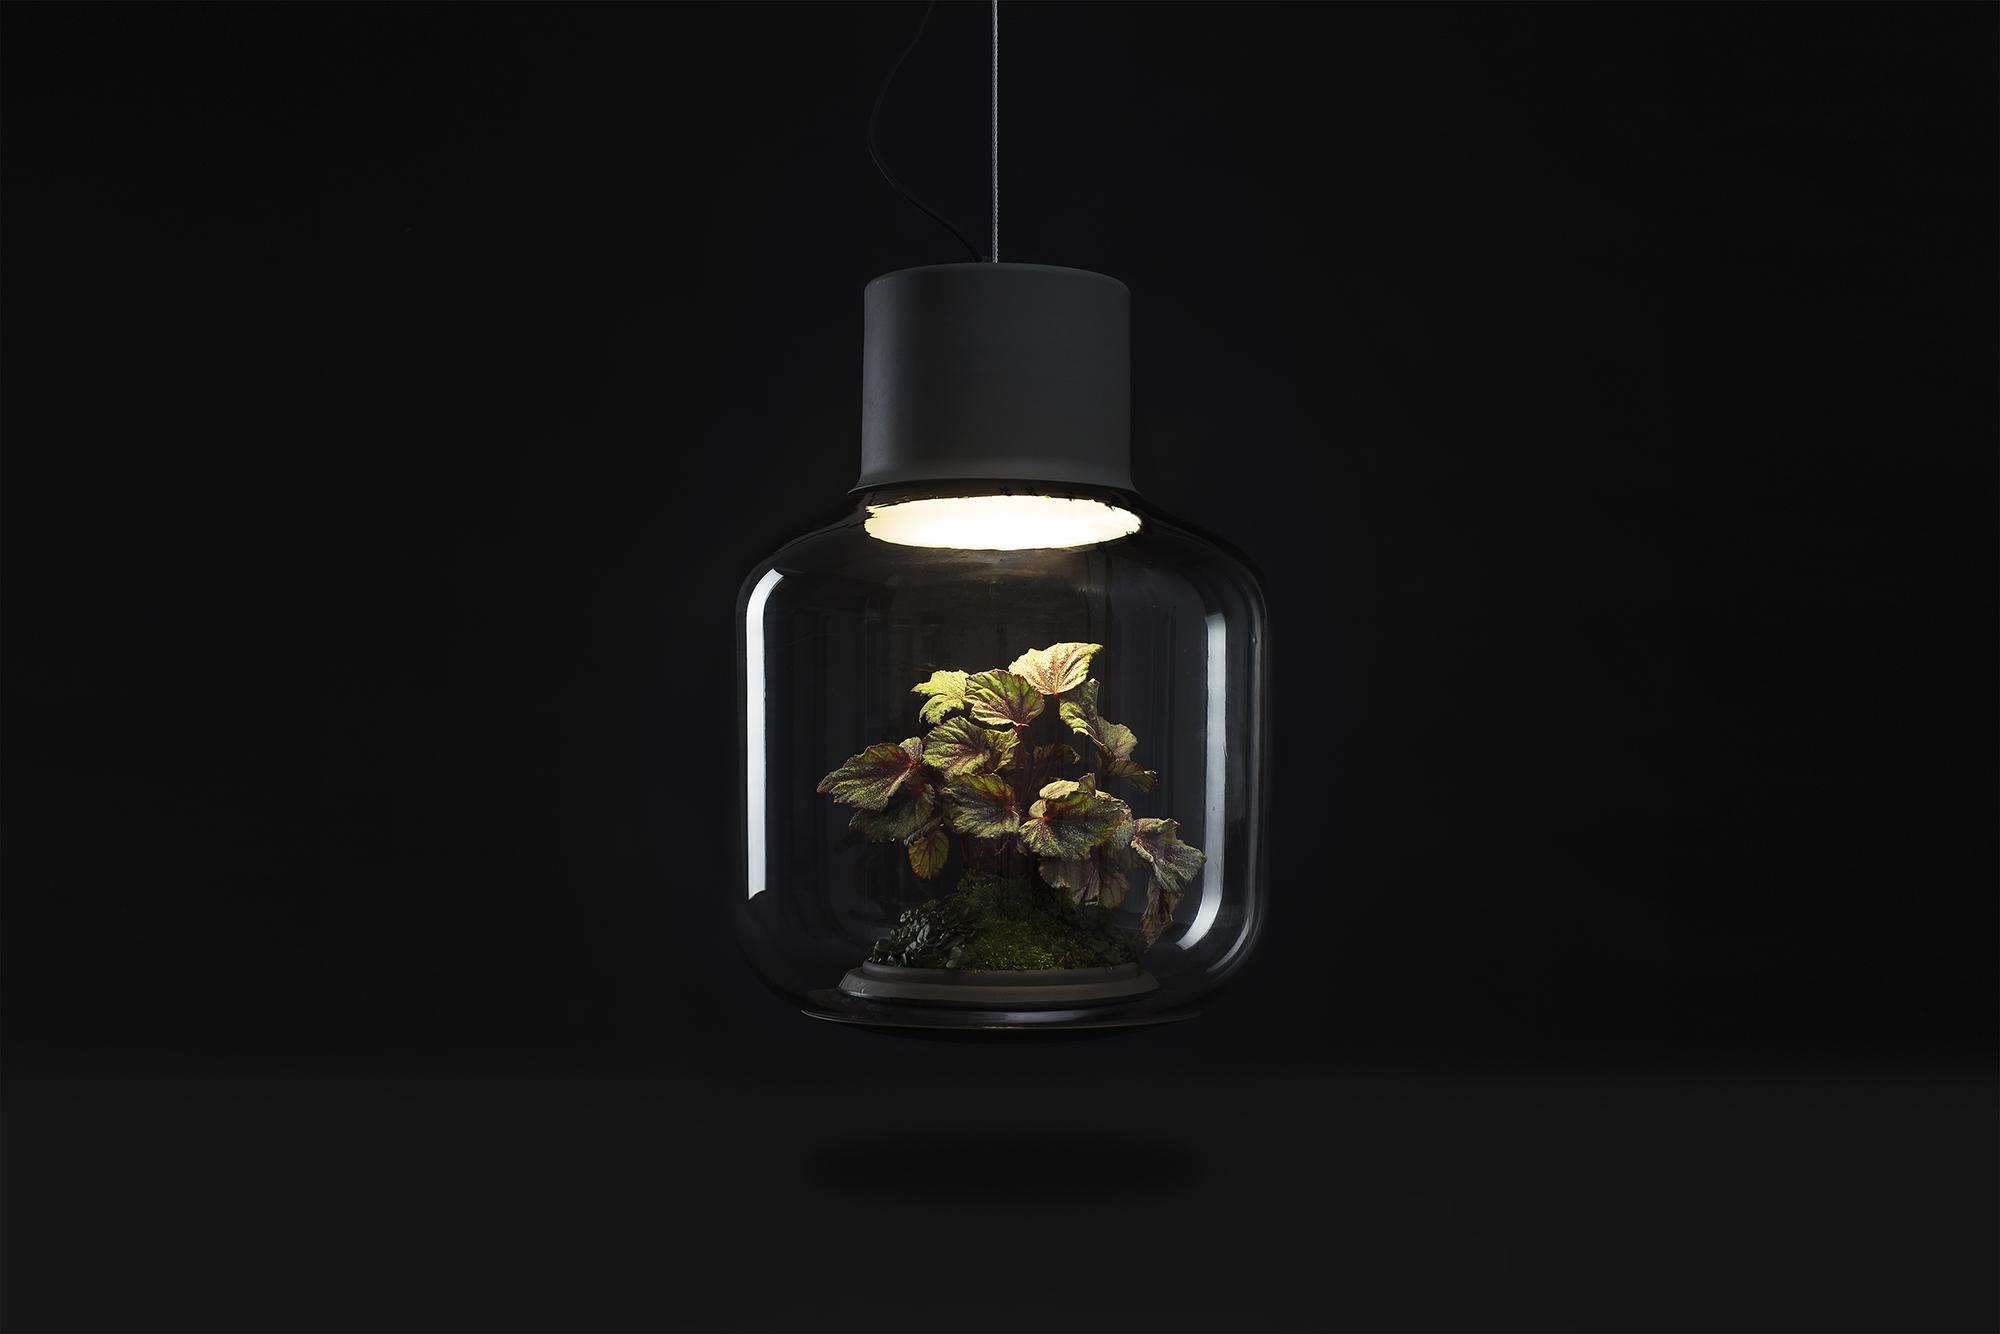 Lamp-mygdal-nui-studio-lamp-lit-terrariums-gangherista-doppelgangher-3